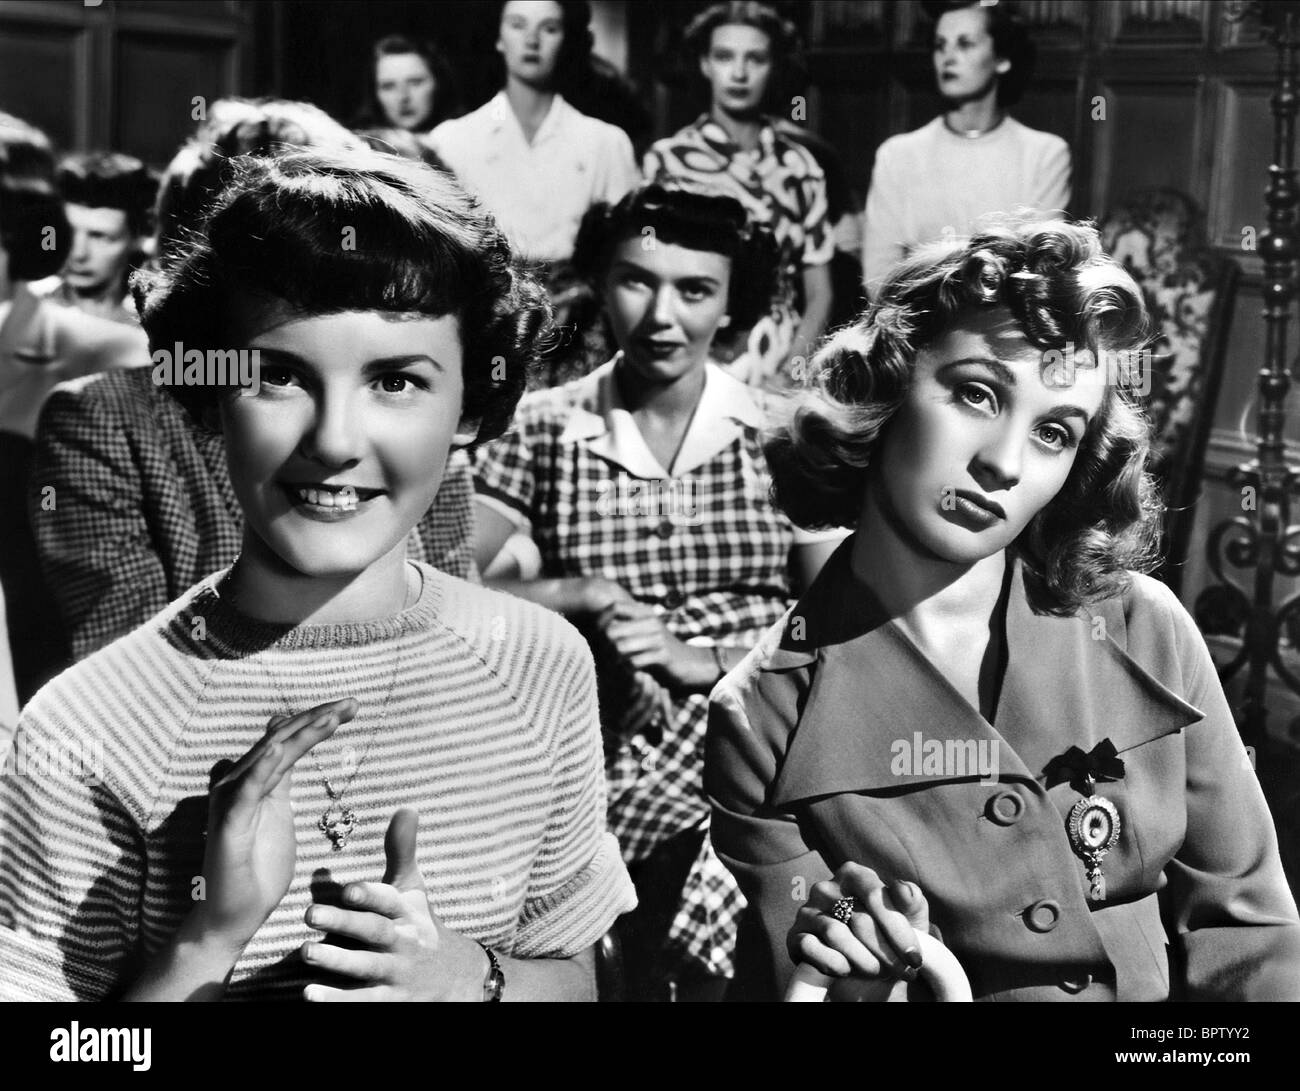 PETULA CLARK, MAI ZETTERLING, THE ROMANTIC AGE, 1949 Stock Photo